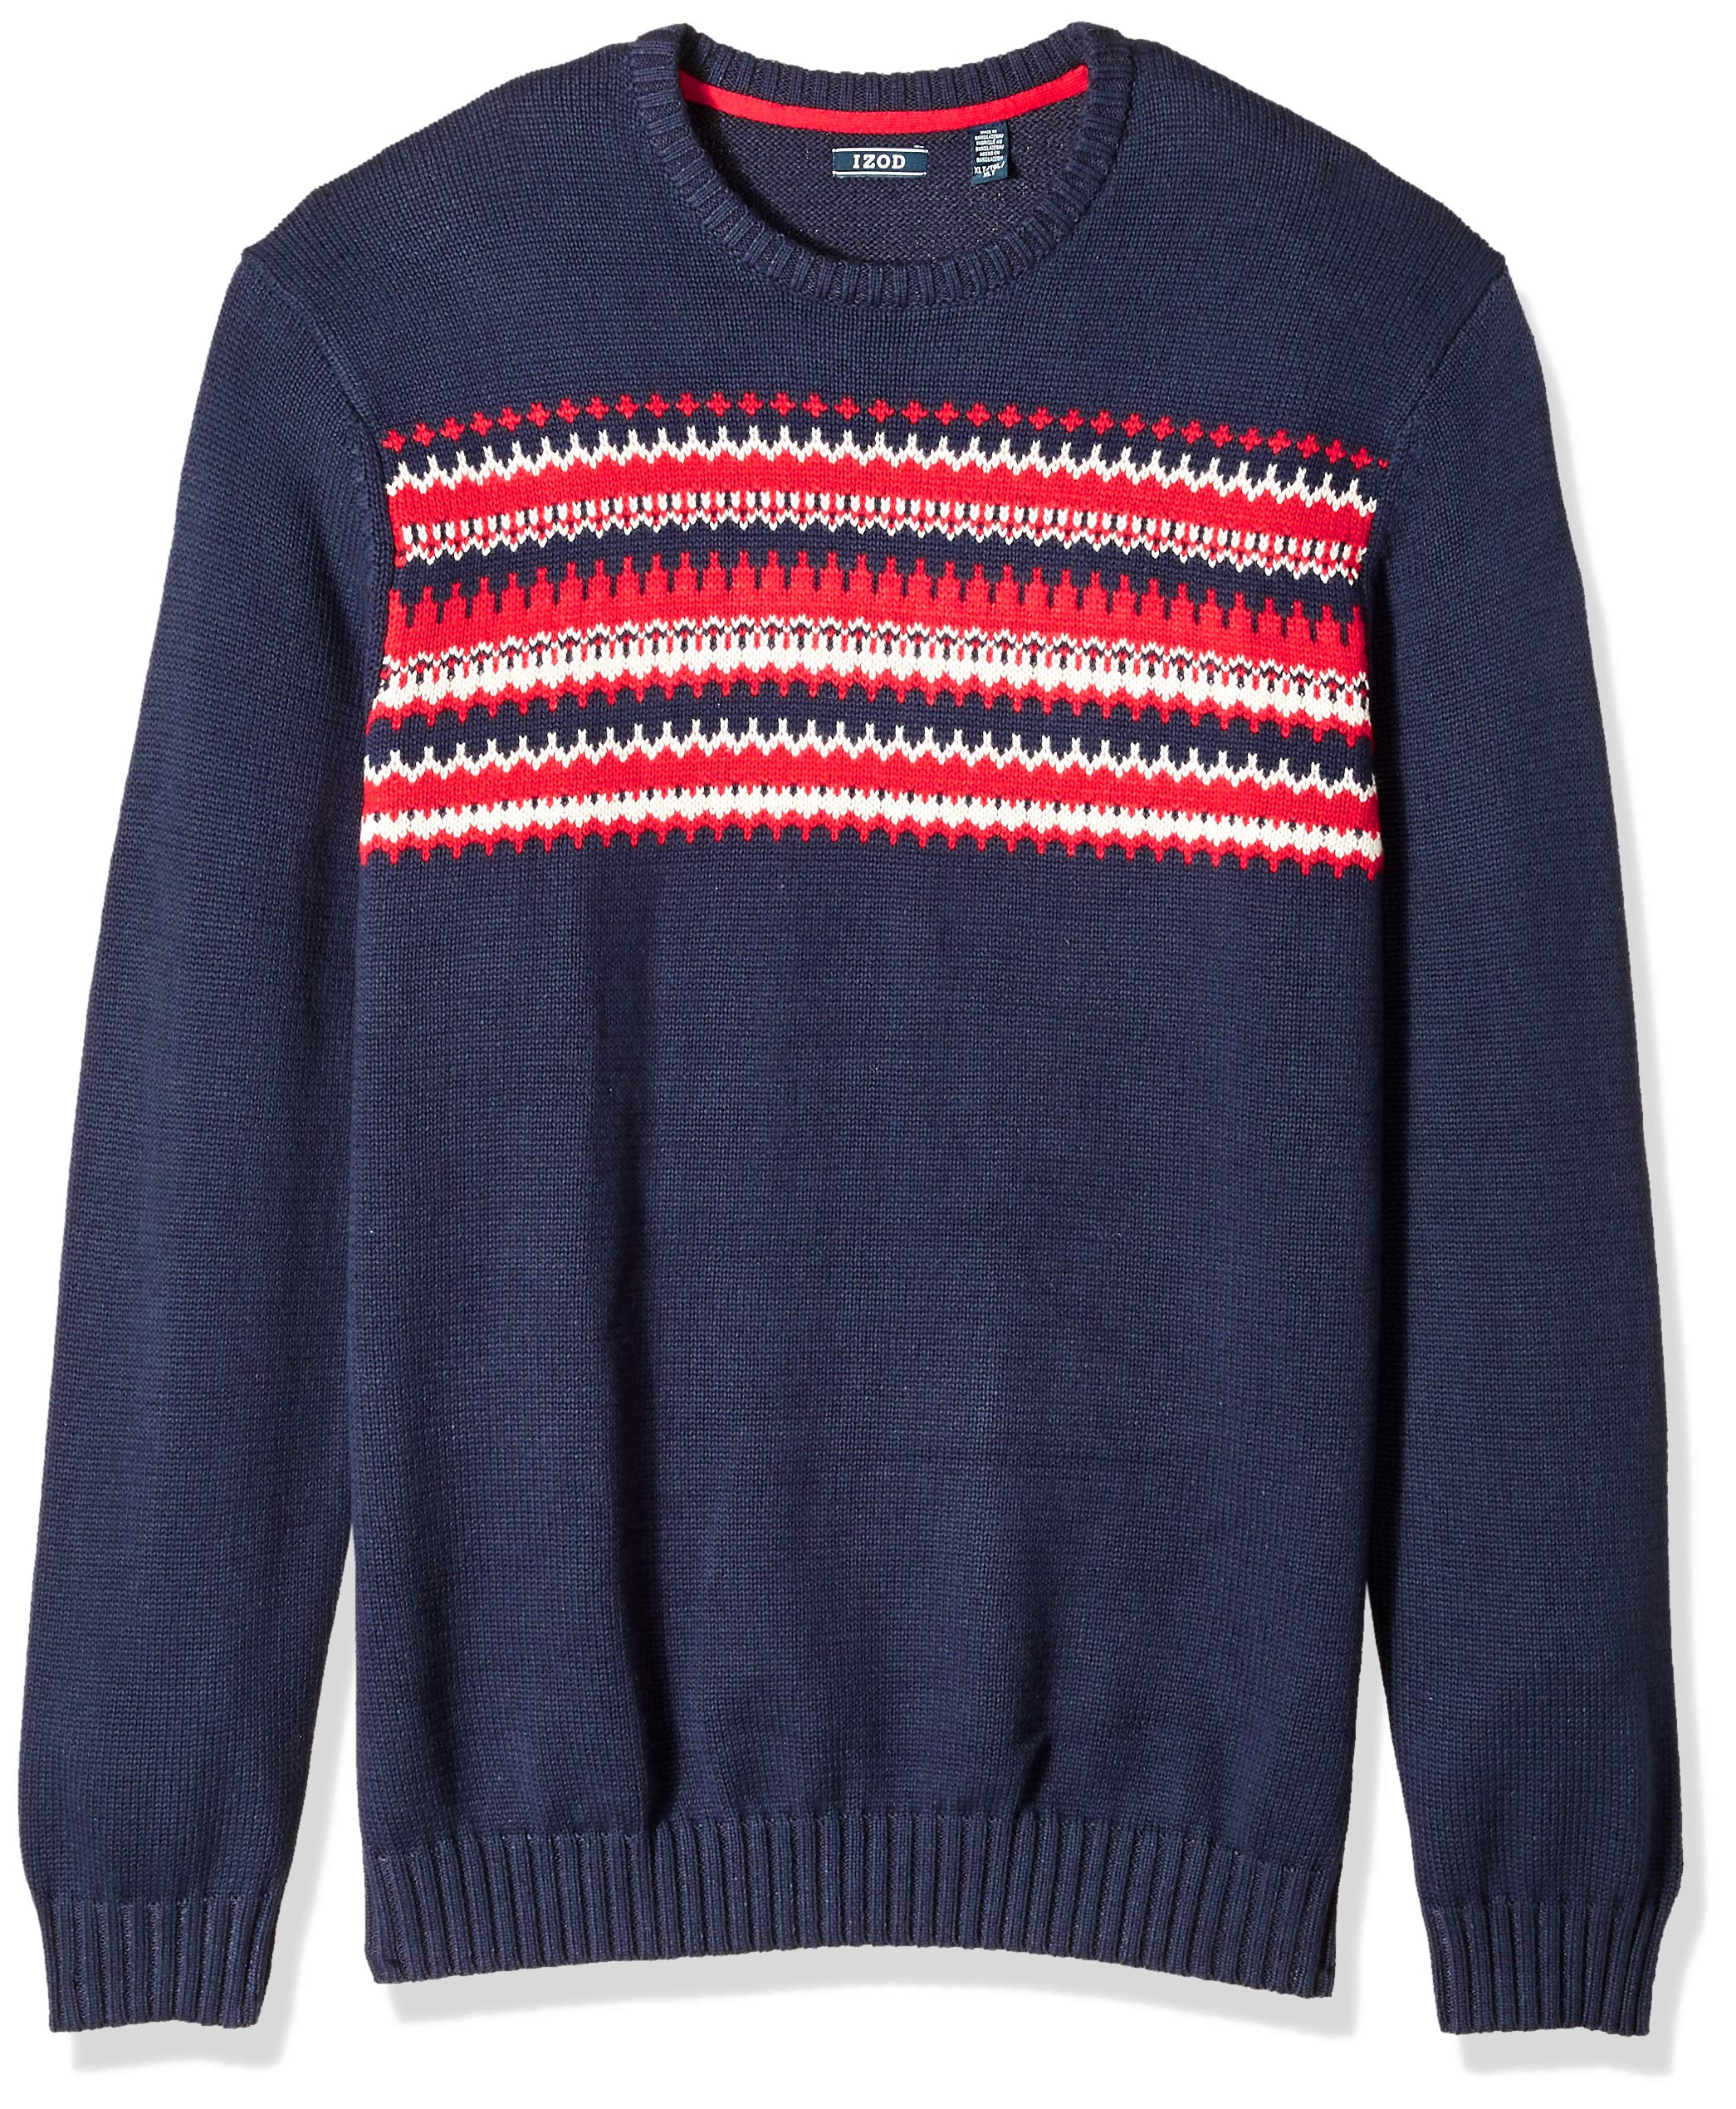 IZOD Men's Big and Tall Fairisle 5 Gauge Crewneck Sweater, Peacoat, 3X-Large